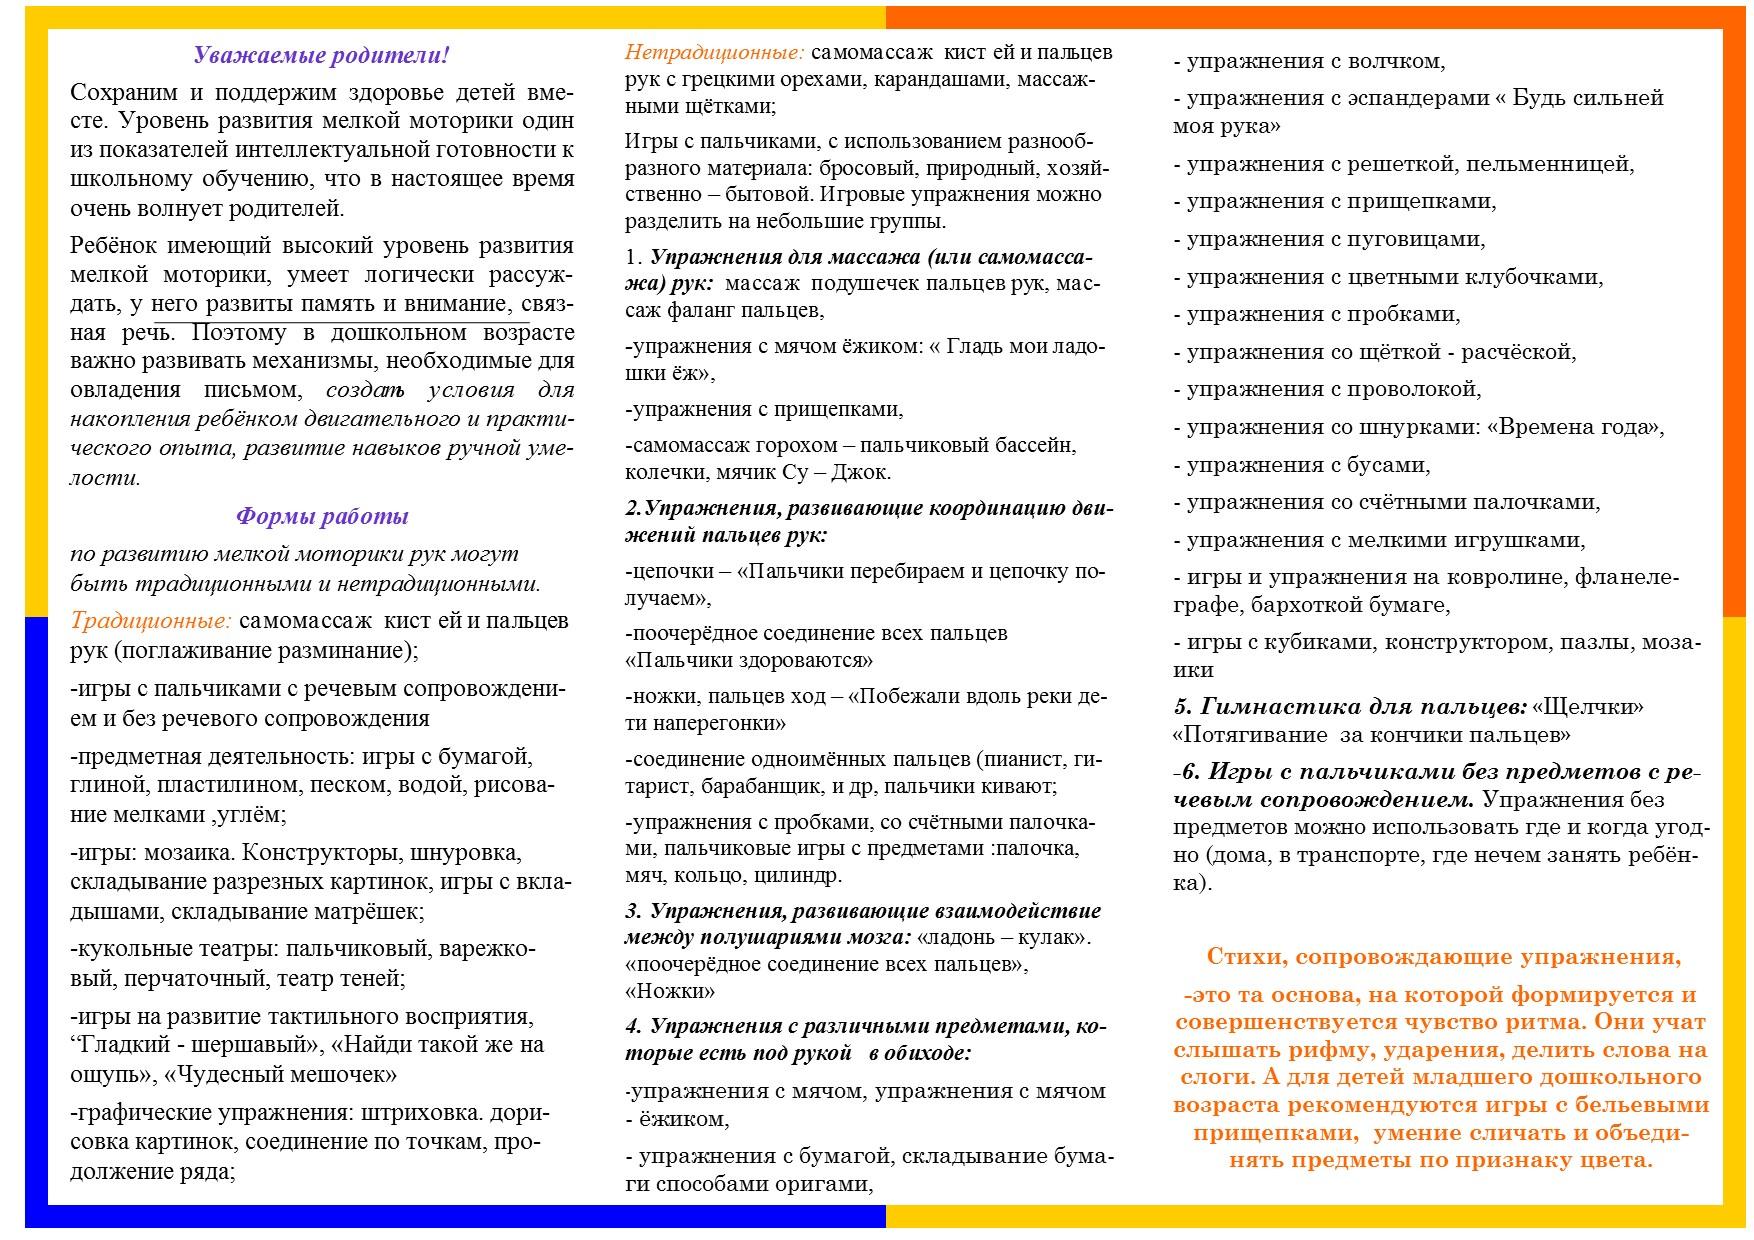 C:\Users\intelcore3\Desktop\Буклет-Таран-Т.М.1.jpg